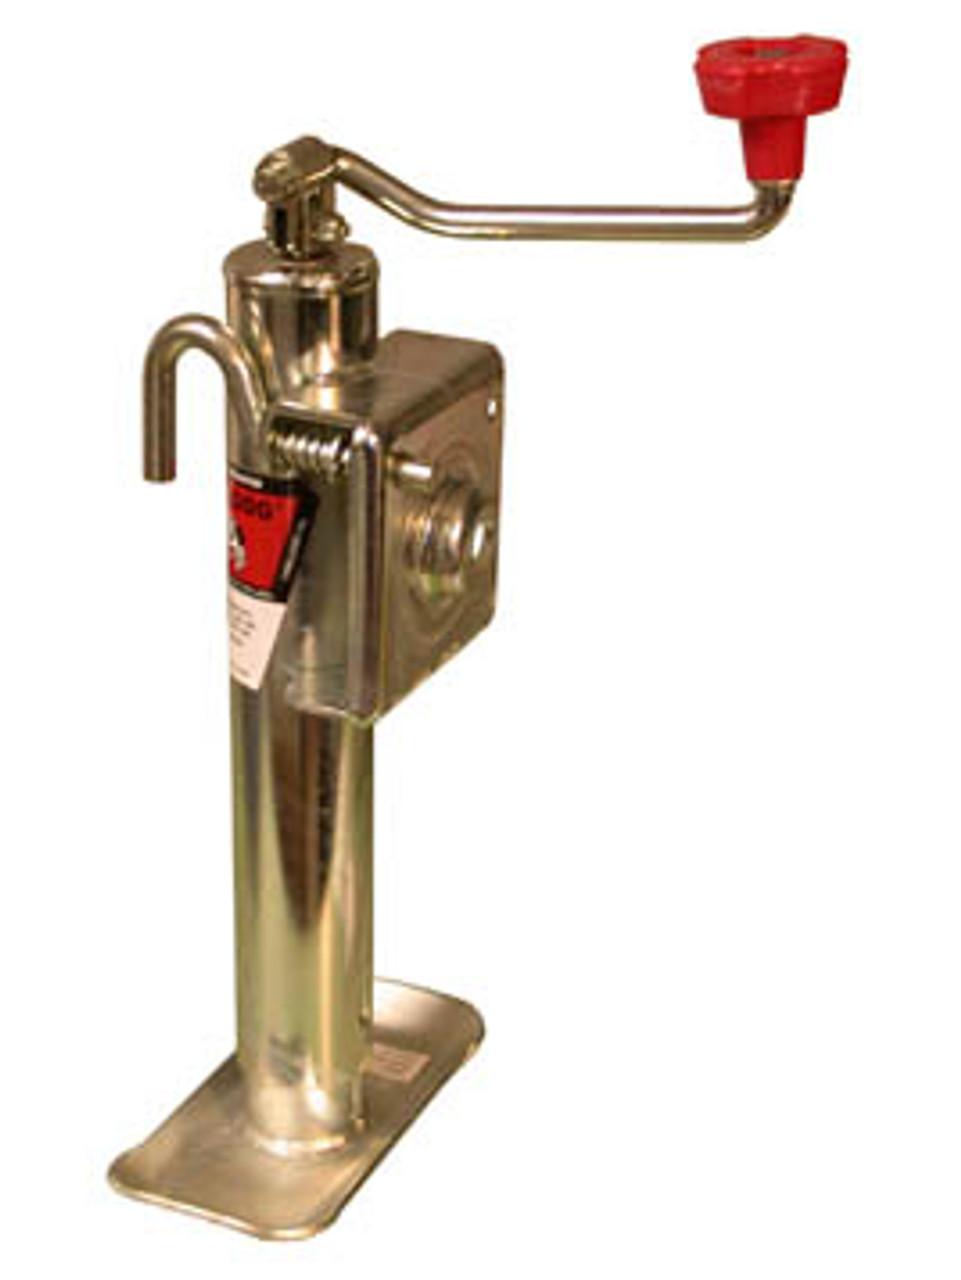 154107 --- BULLDOG Swivel Topwind Trailer Jack - 2,000 lb